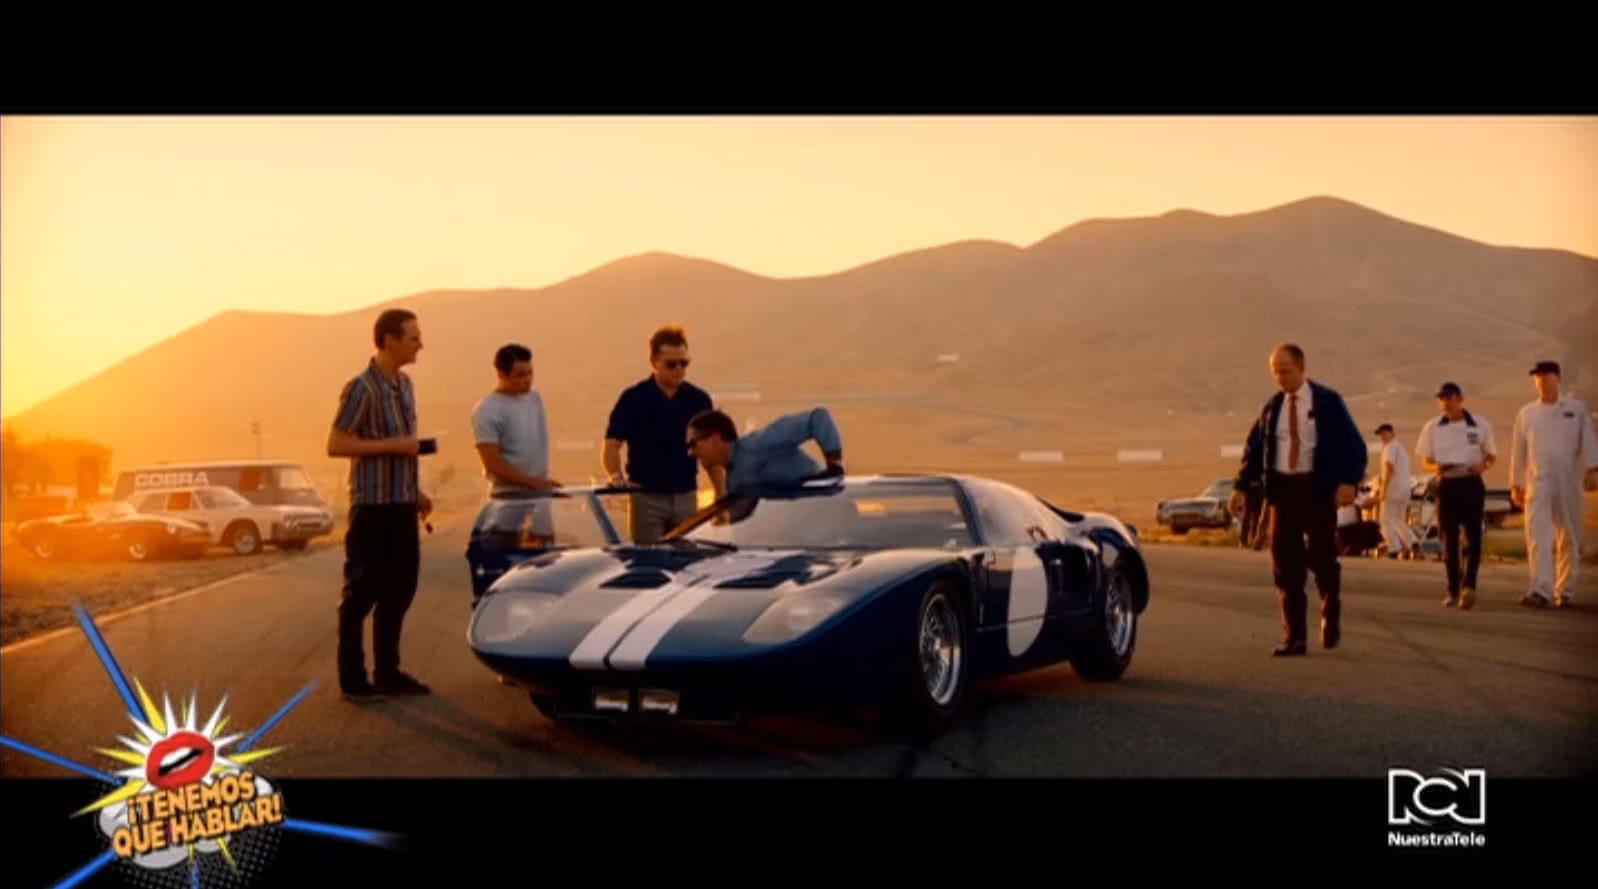 Formatos caseros de 'Ford V Ferrari' estarán disponibles desde el 11 de febrero